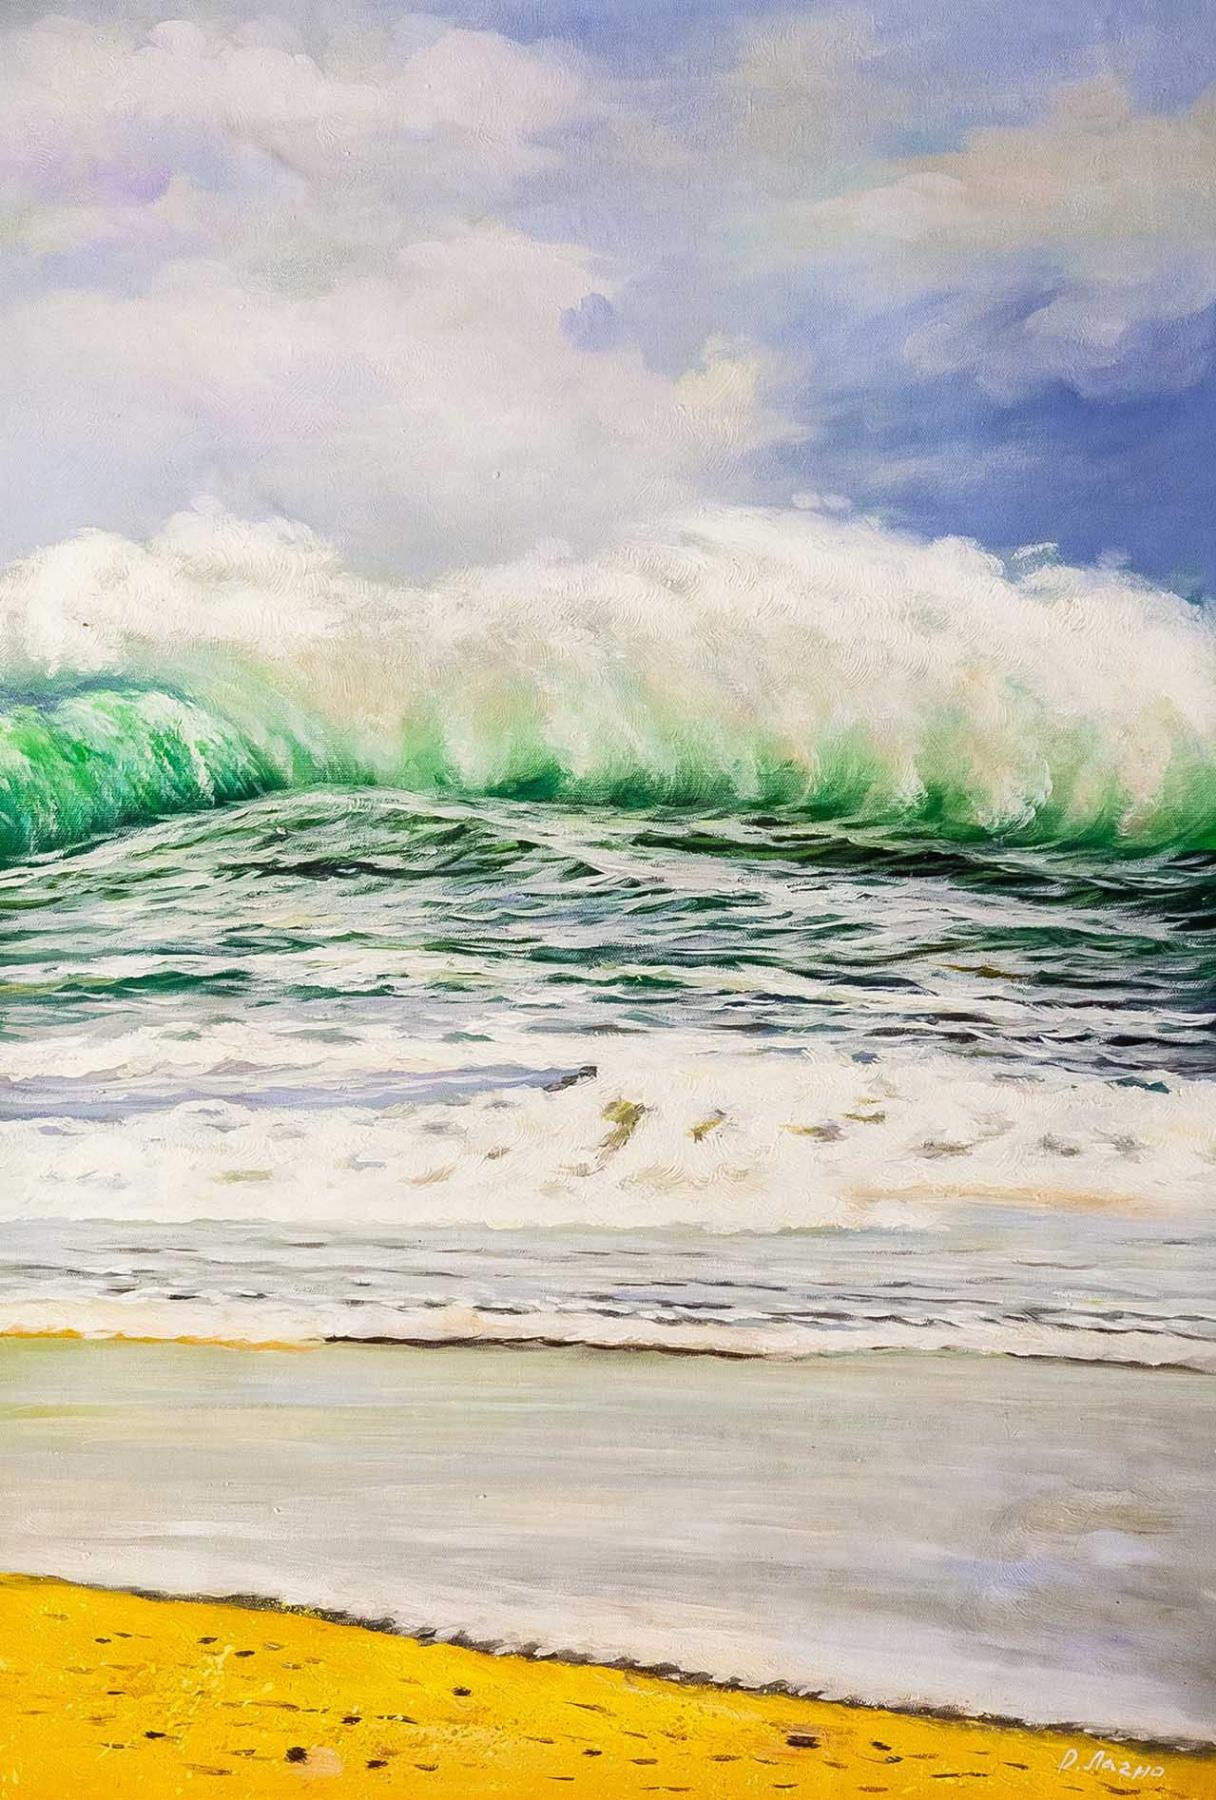 Daria Feliksovna Lagno. In the emerald sea N5